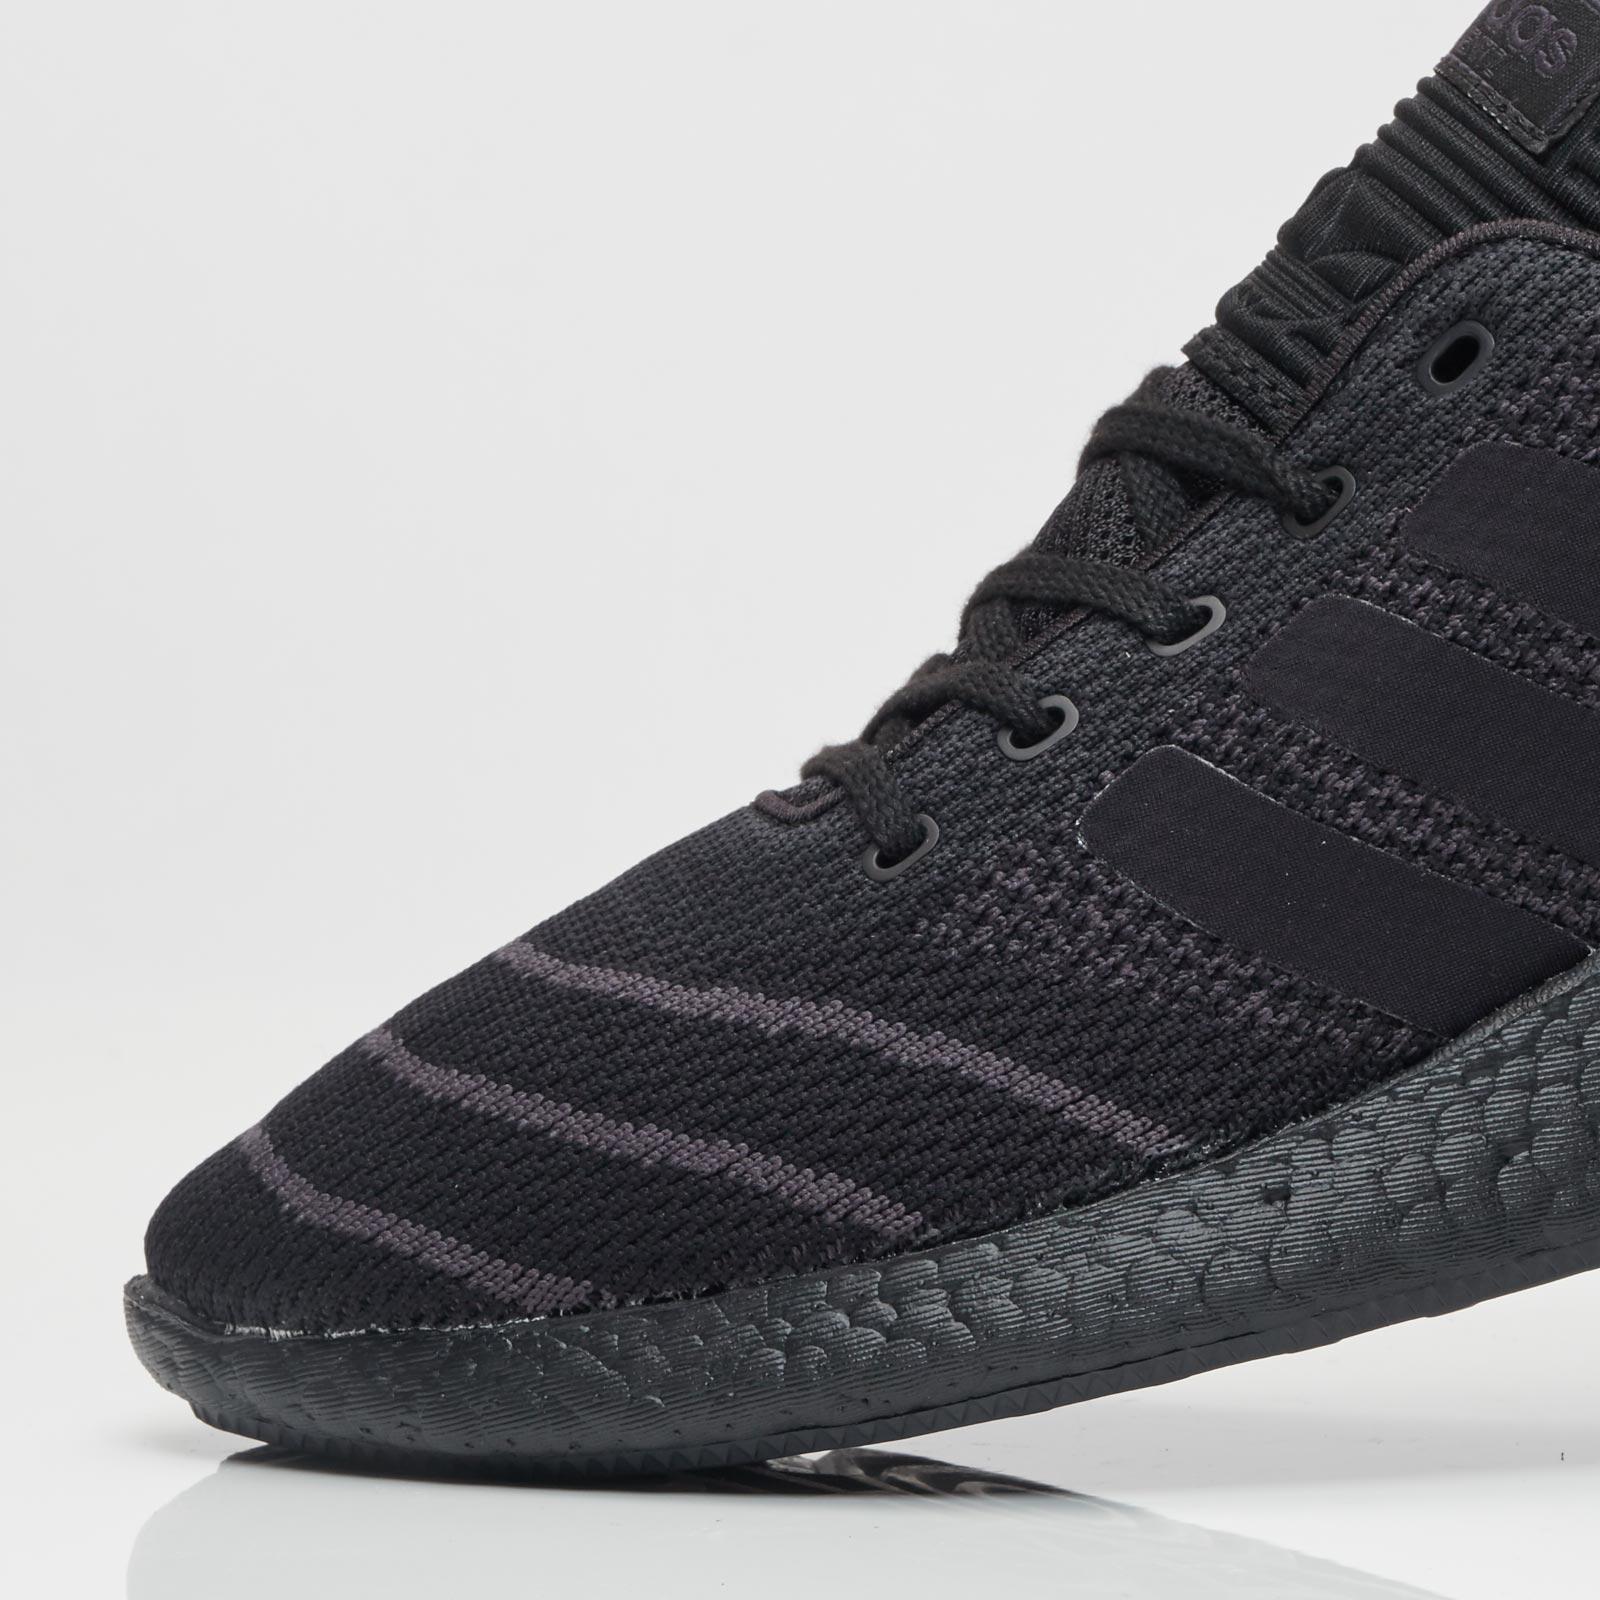 796aebda5 adidas Busenitz Pure Boost PK - By4091 - Sneakersnstuff